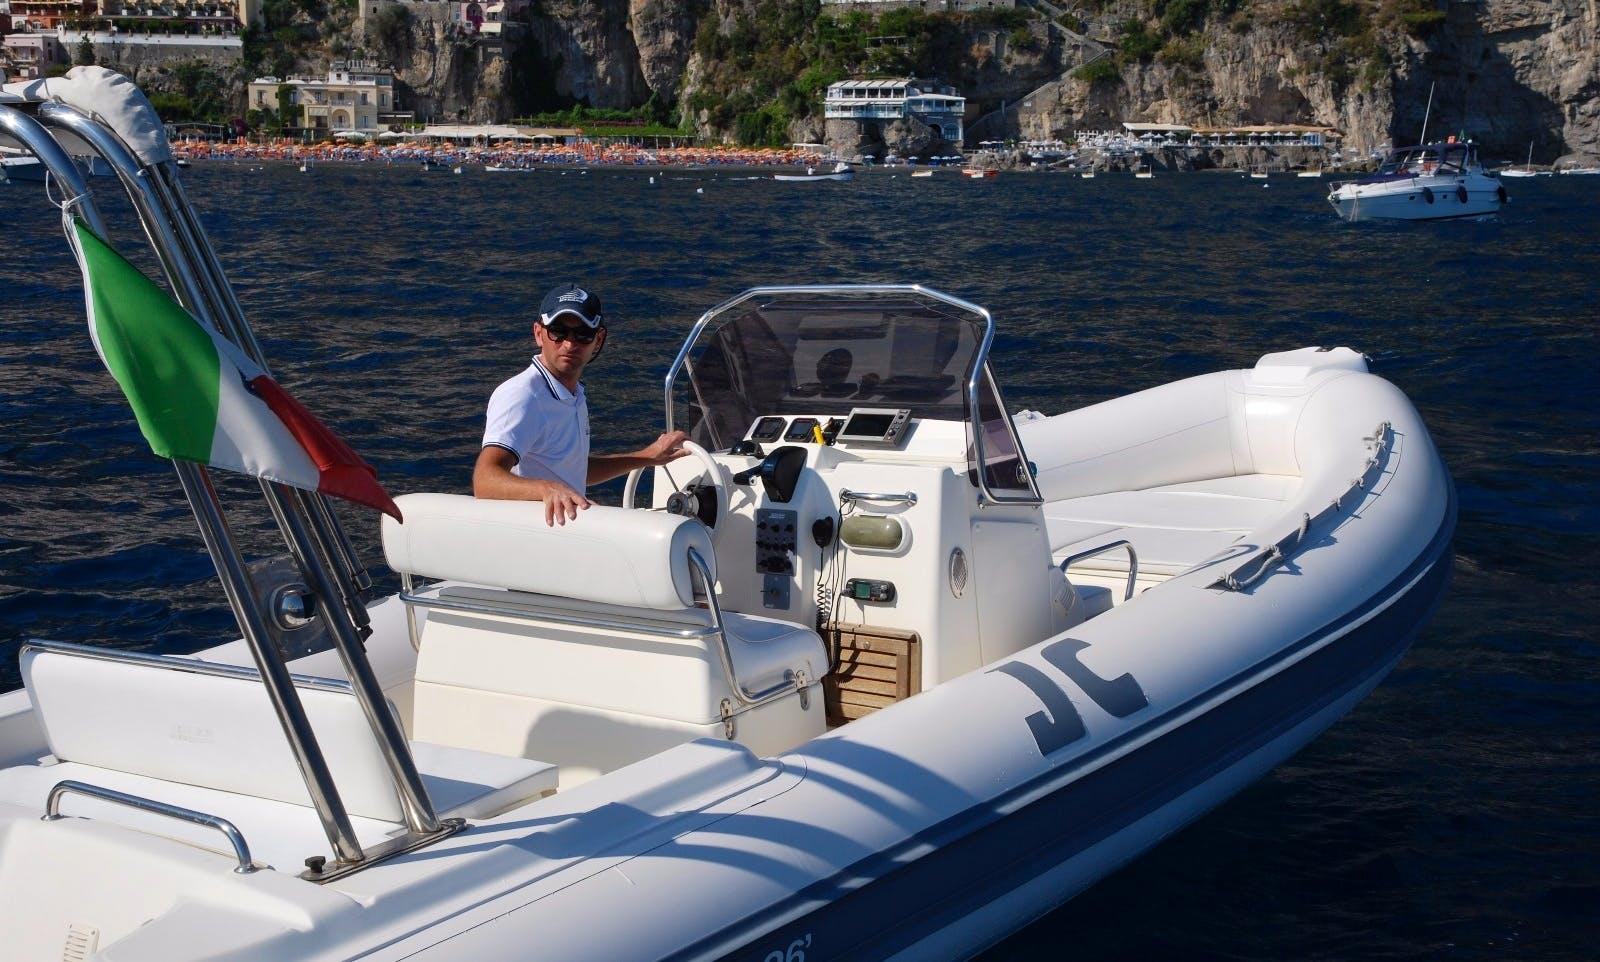 Dinghy rental in Positano for cruising the Amalfi Coast